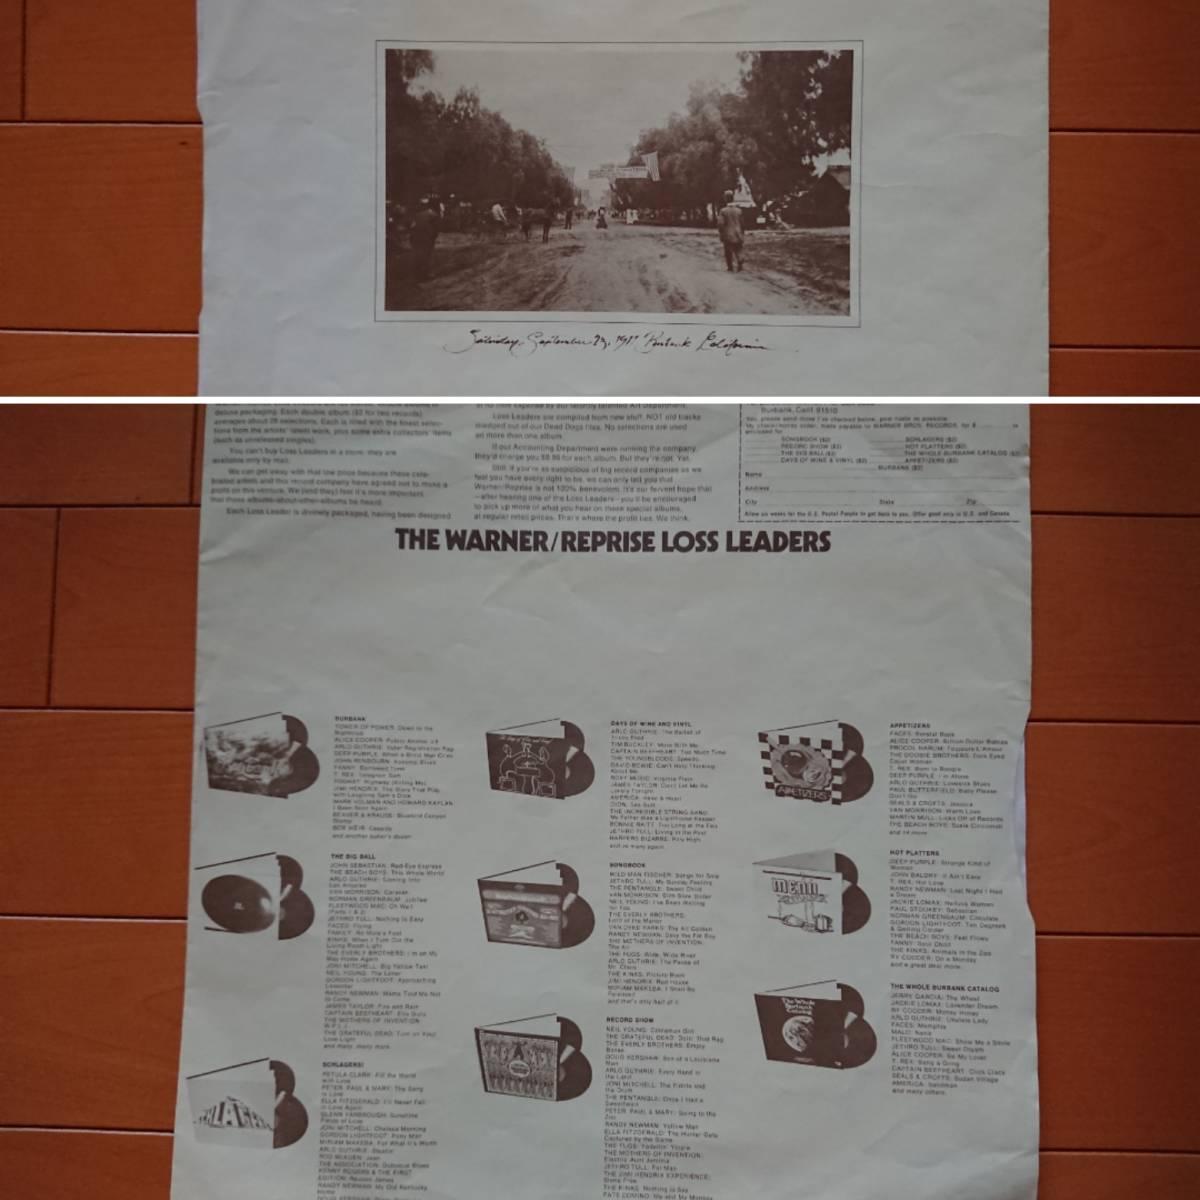 US白プロモLP 1974年 ドゥービーブラザーズ The Doobie Brothers「What Were Once Vices Are Now Habits」(Warner)PROMO,ドゥービー天国_インナースリーブ